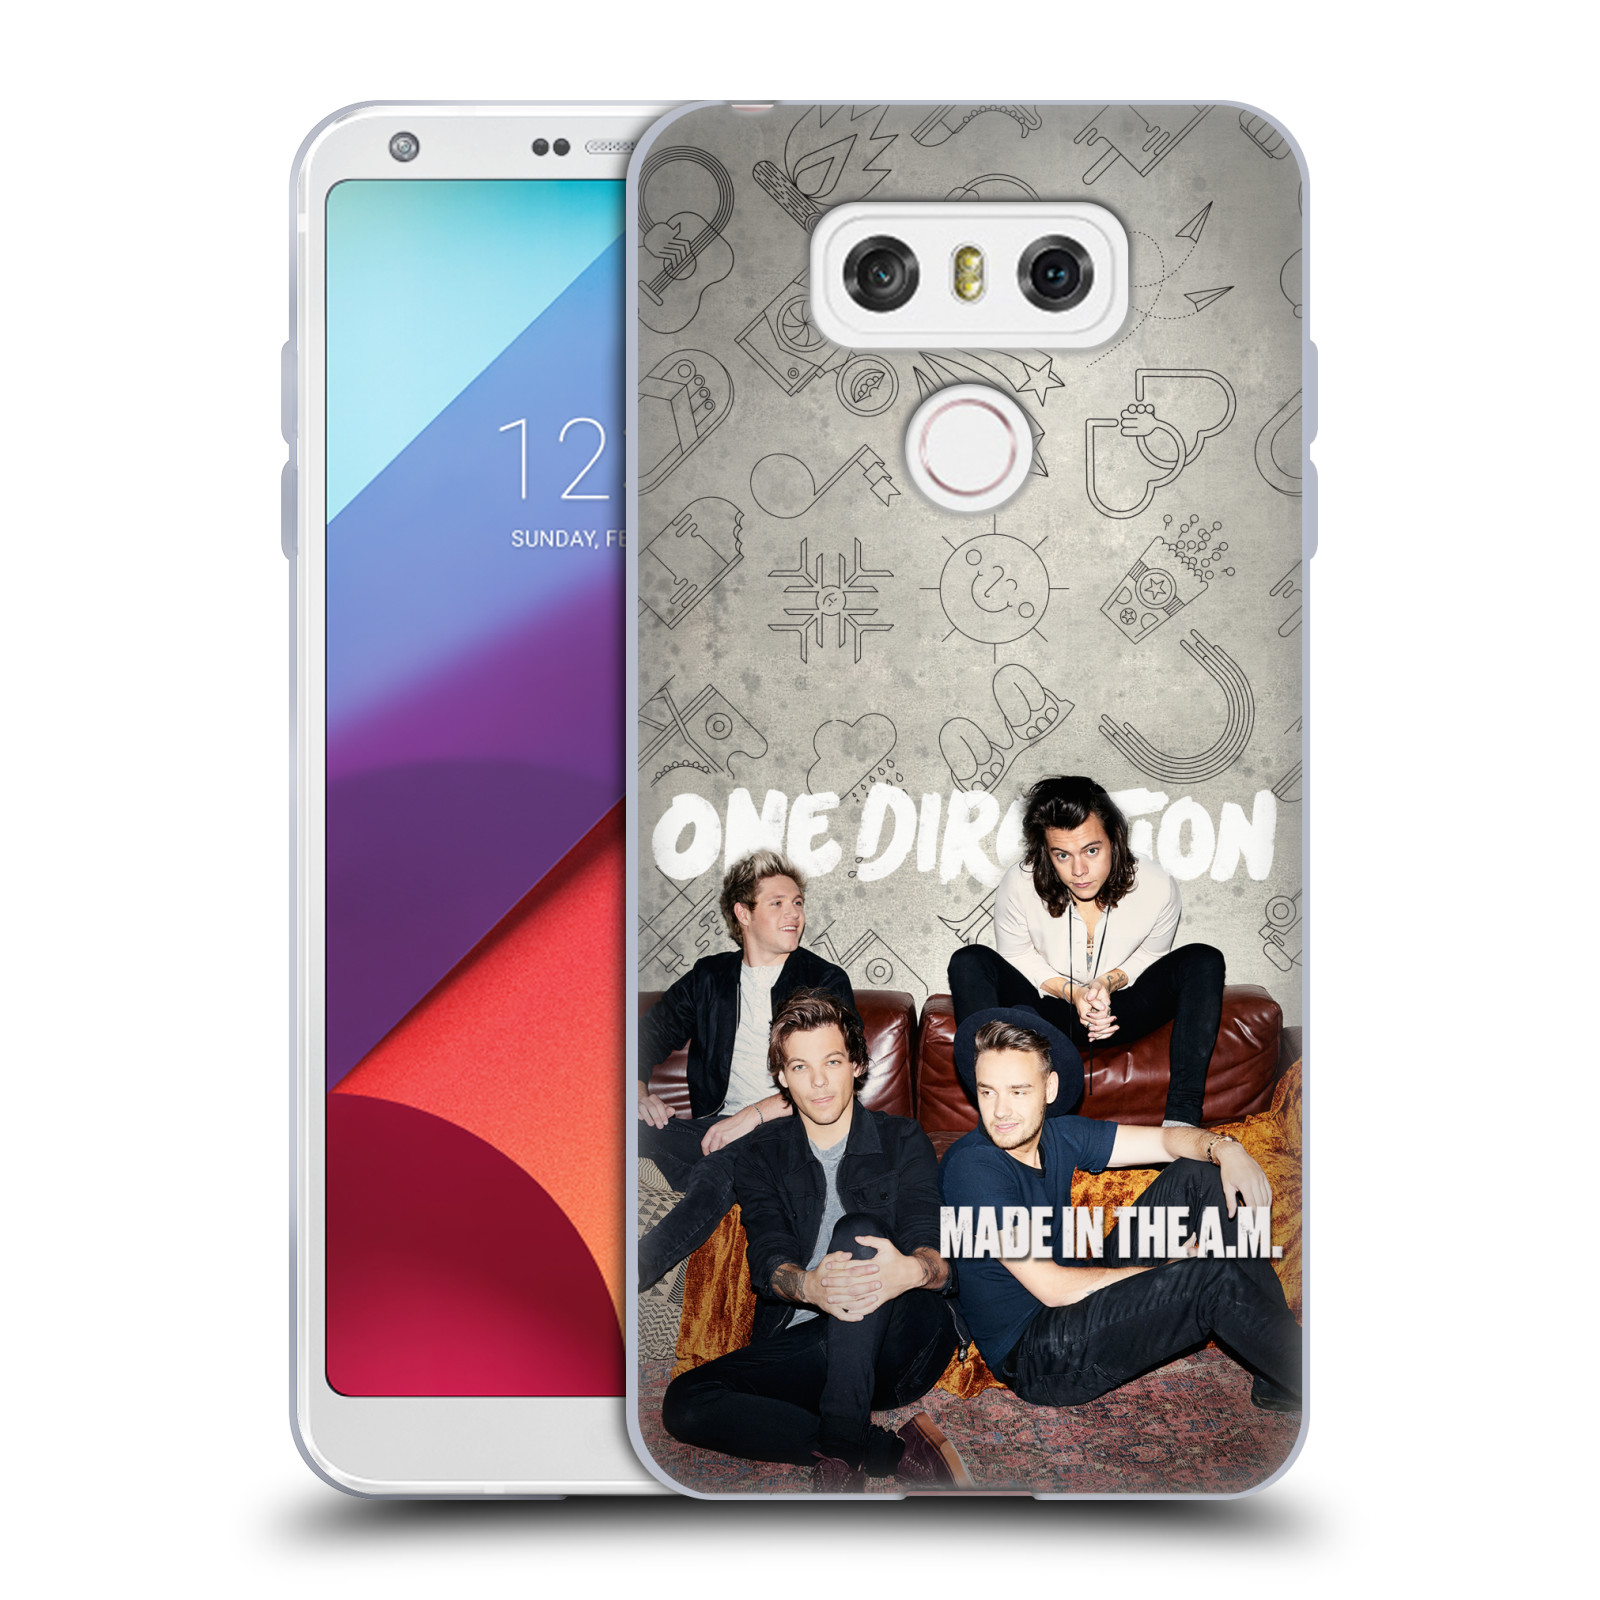 HEAD CASE silikonový obal na mobil LG G6 / G6 DUAL chlapecká skupina One Direction gauč